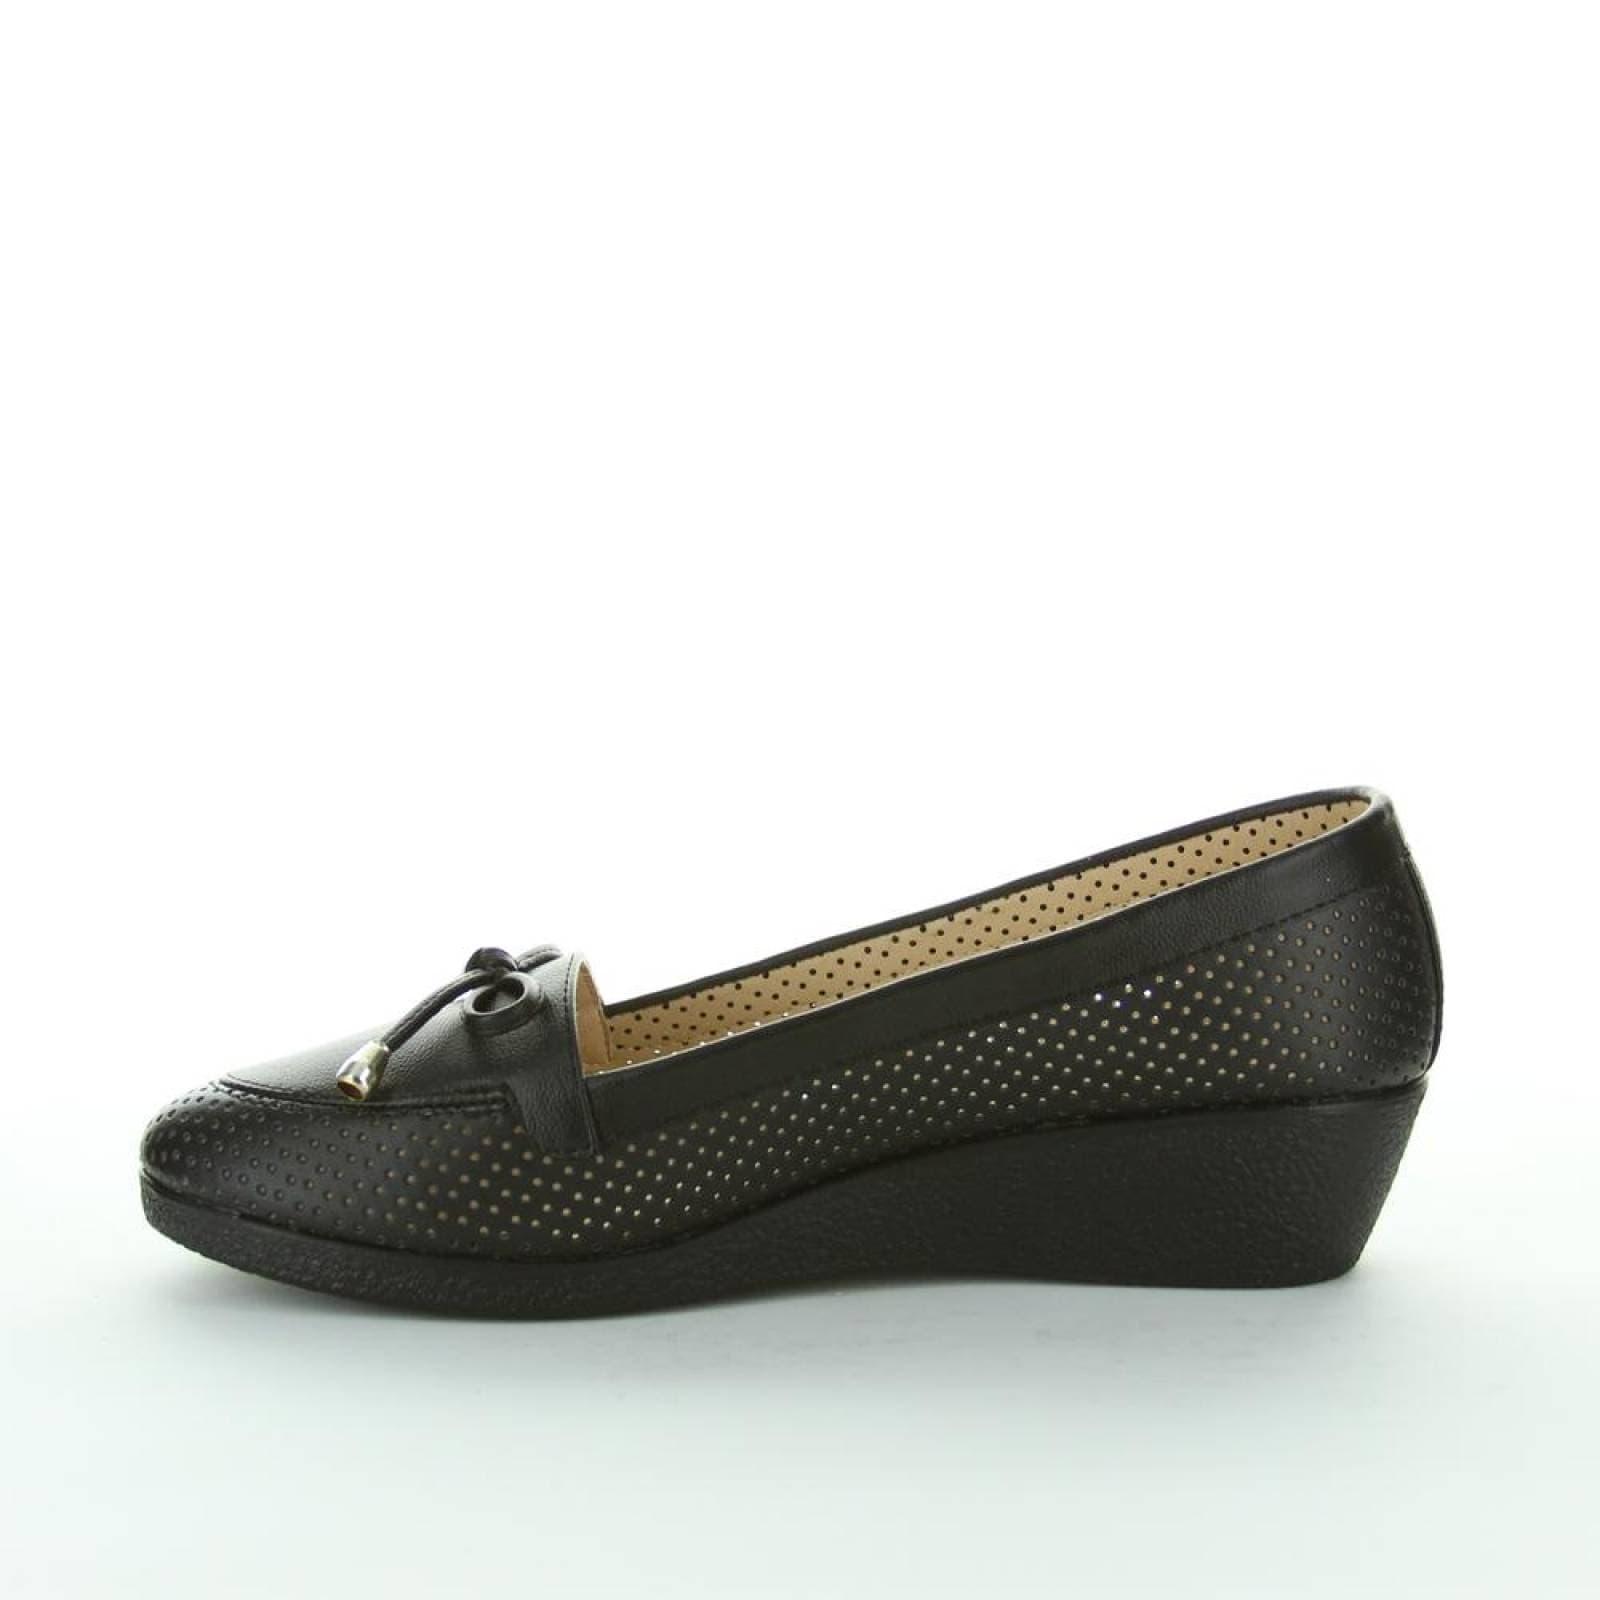 Zapato Cerrado Padus Mujer Negro Tipo Napa Nub016